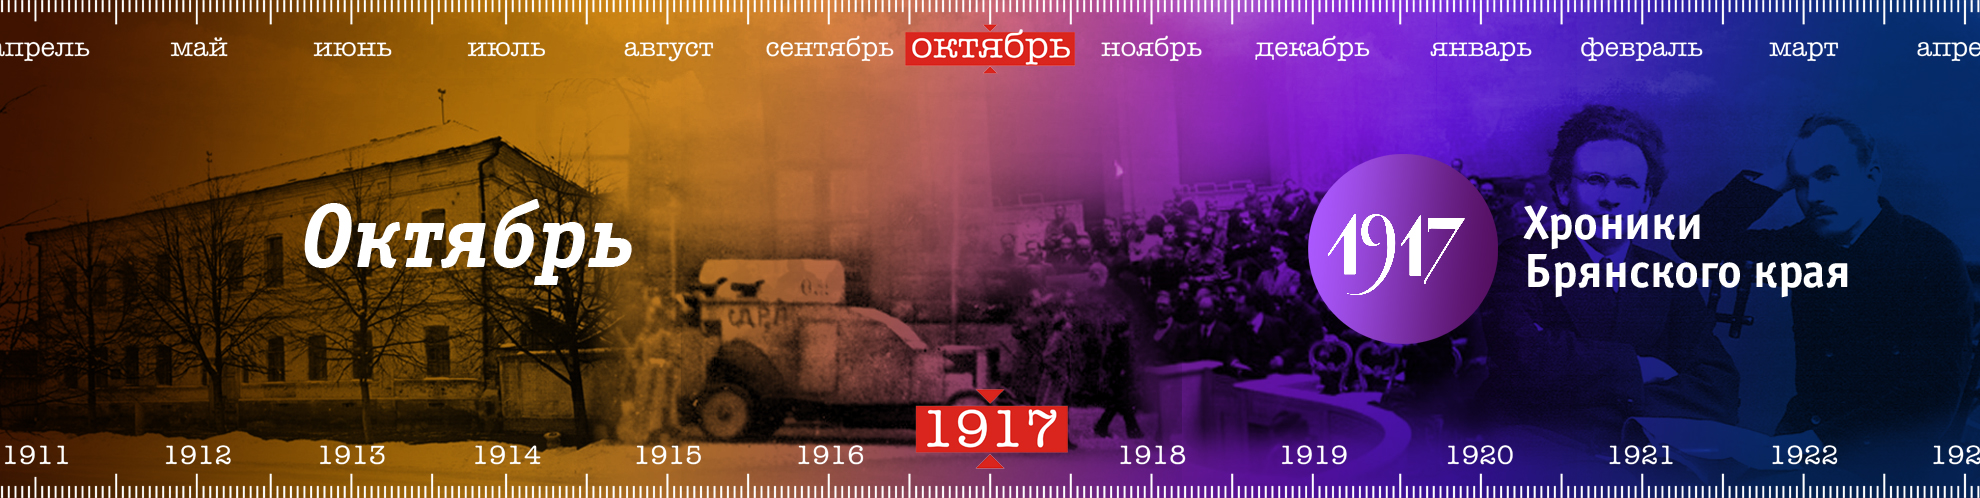 1917. Хроники Брянского края - Октябрь